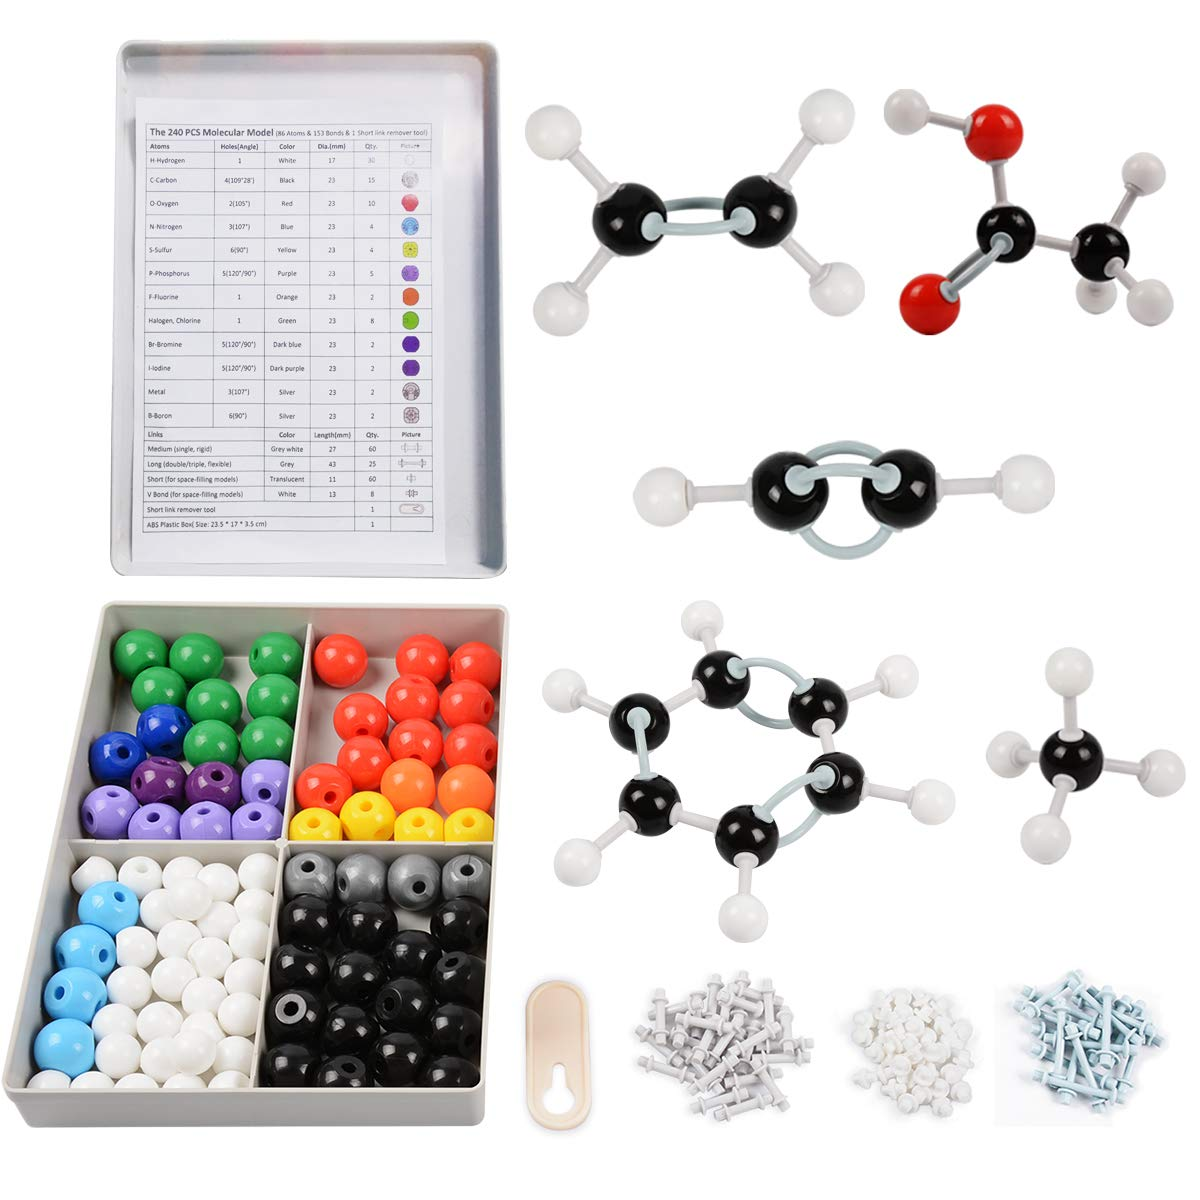 Molecular Model Kit 252 Pcs Molecular Model Teacher and Student Kit Organic Inorganic Chemistry Set for Building Molecules 86 Atoms /& 153 Links /& 12 Orbitals /& 1 Short Link Remover Tool